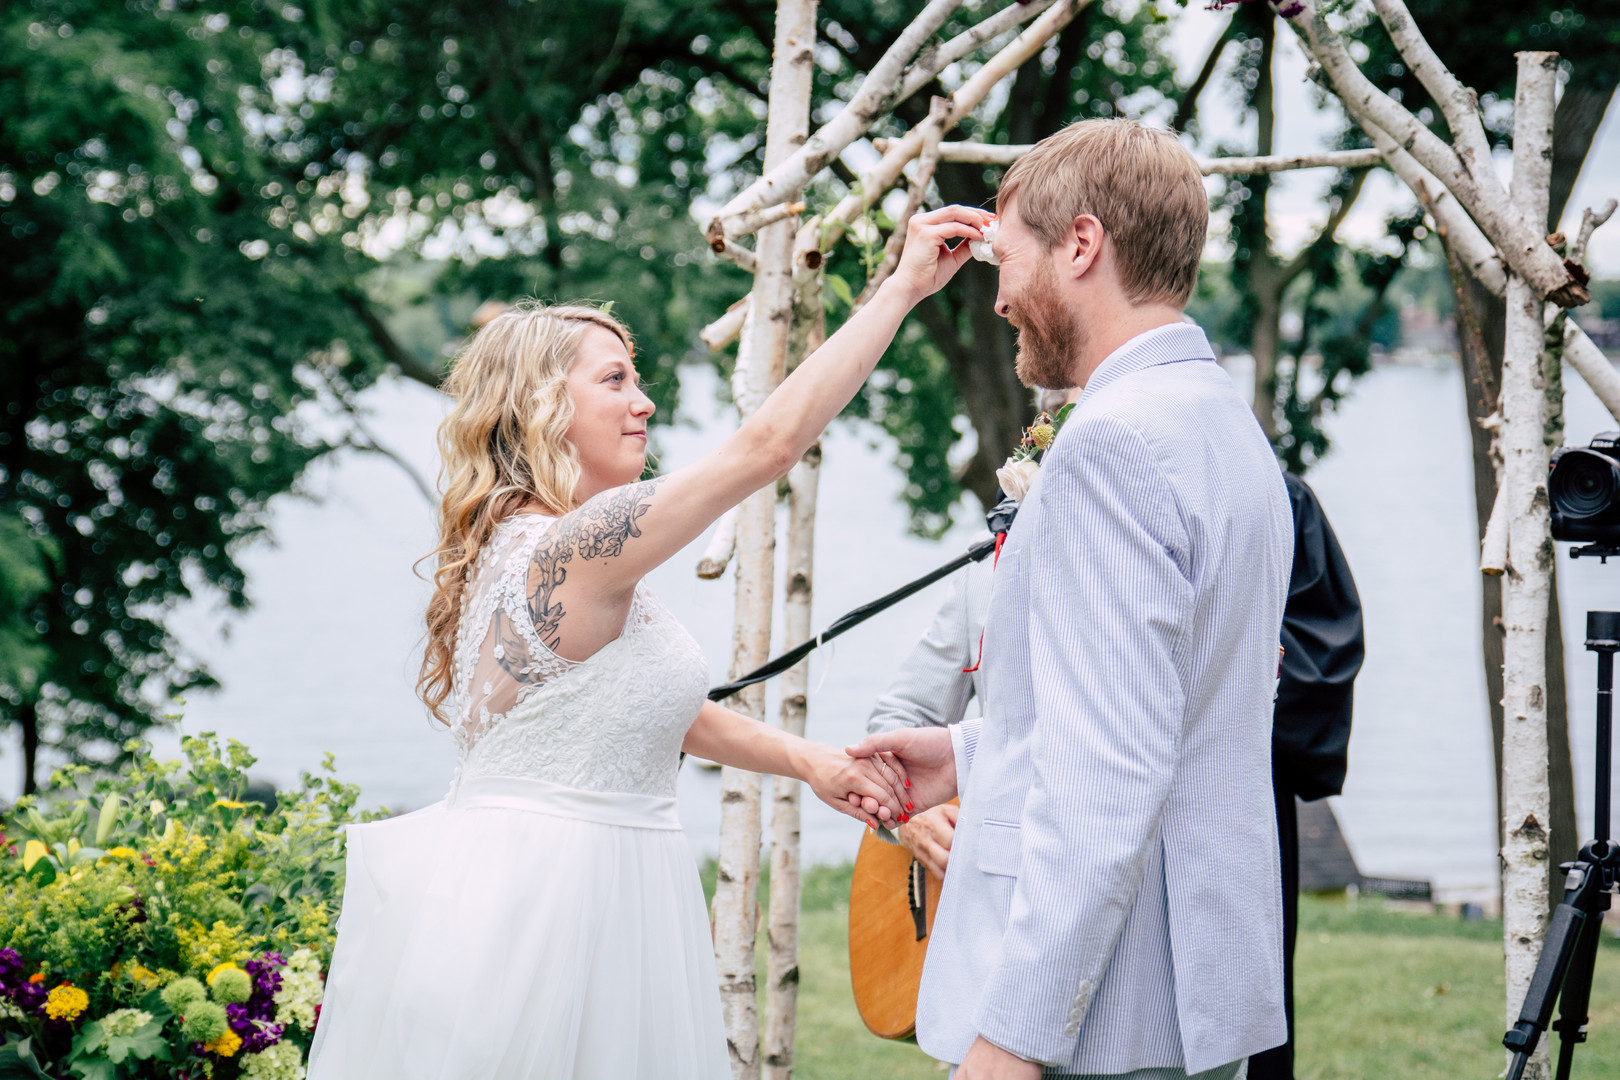 Wedding Photography - Prior Lake Minnesota